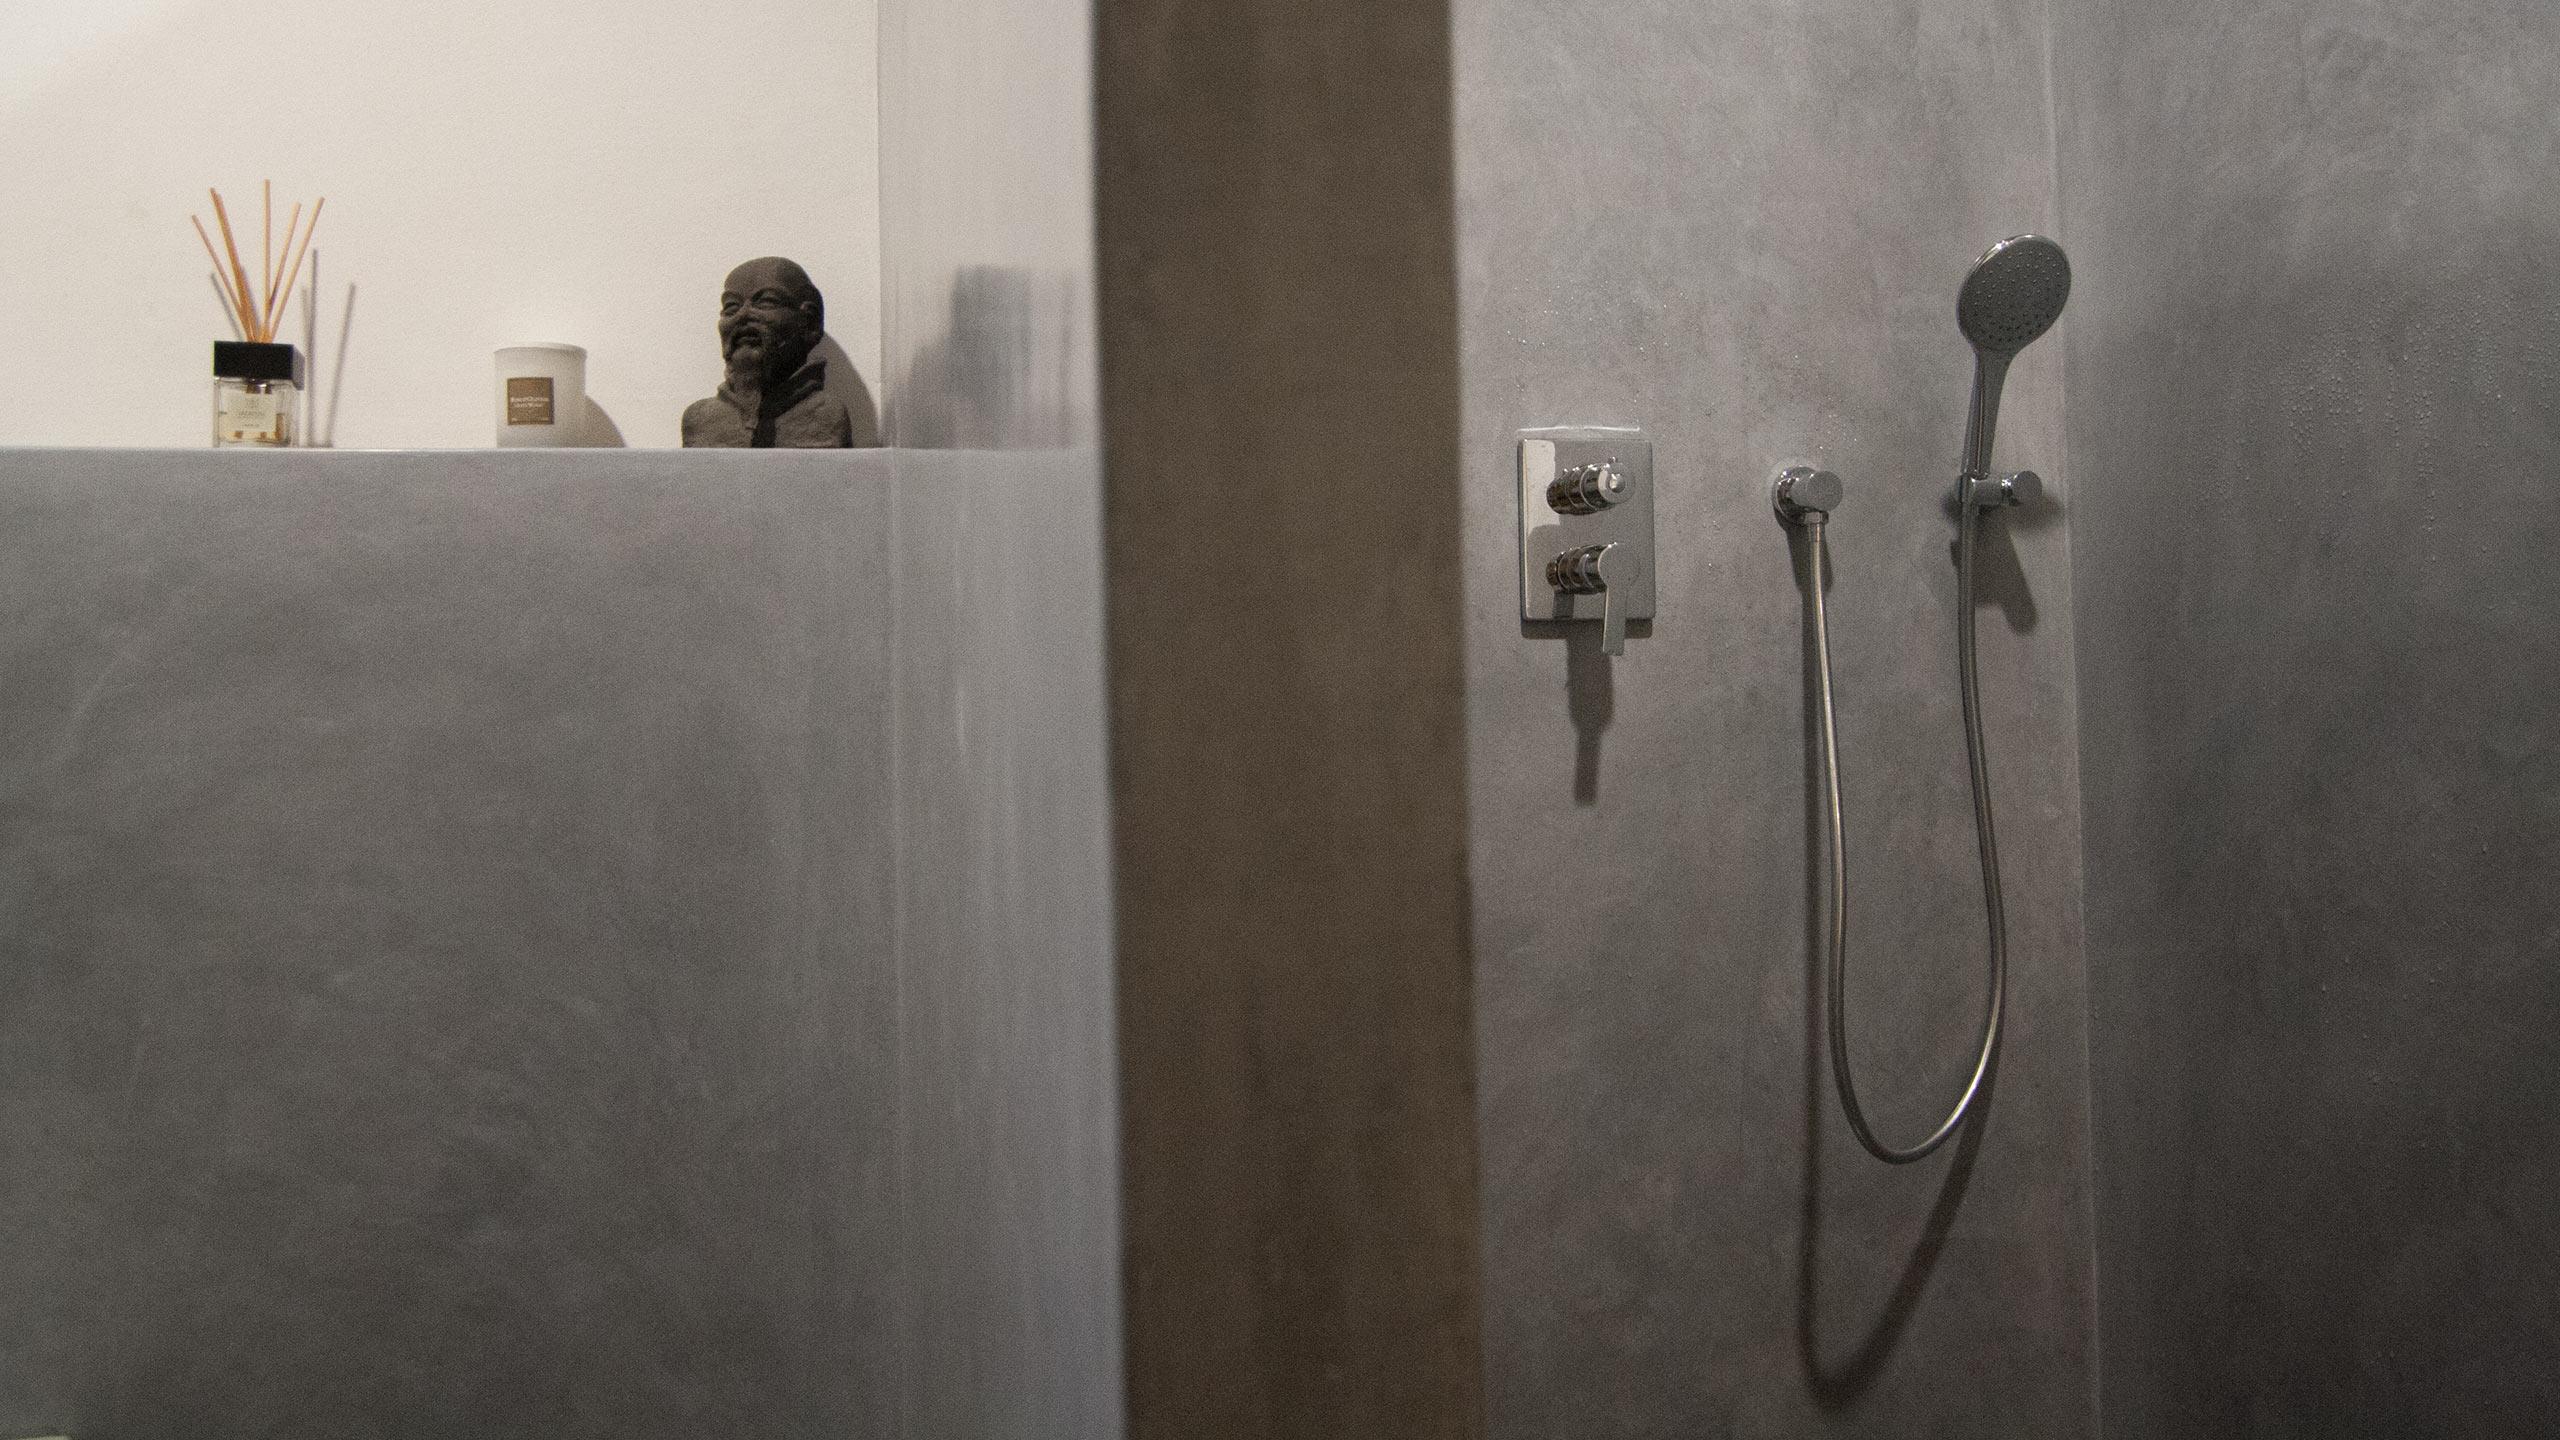 WaterproofStucco - Pearl Grey Bathroom, Caring for details